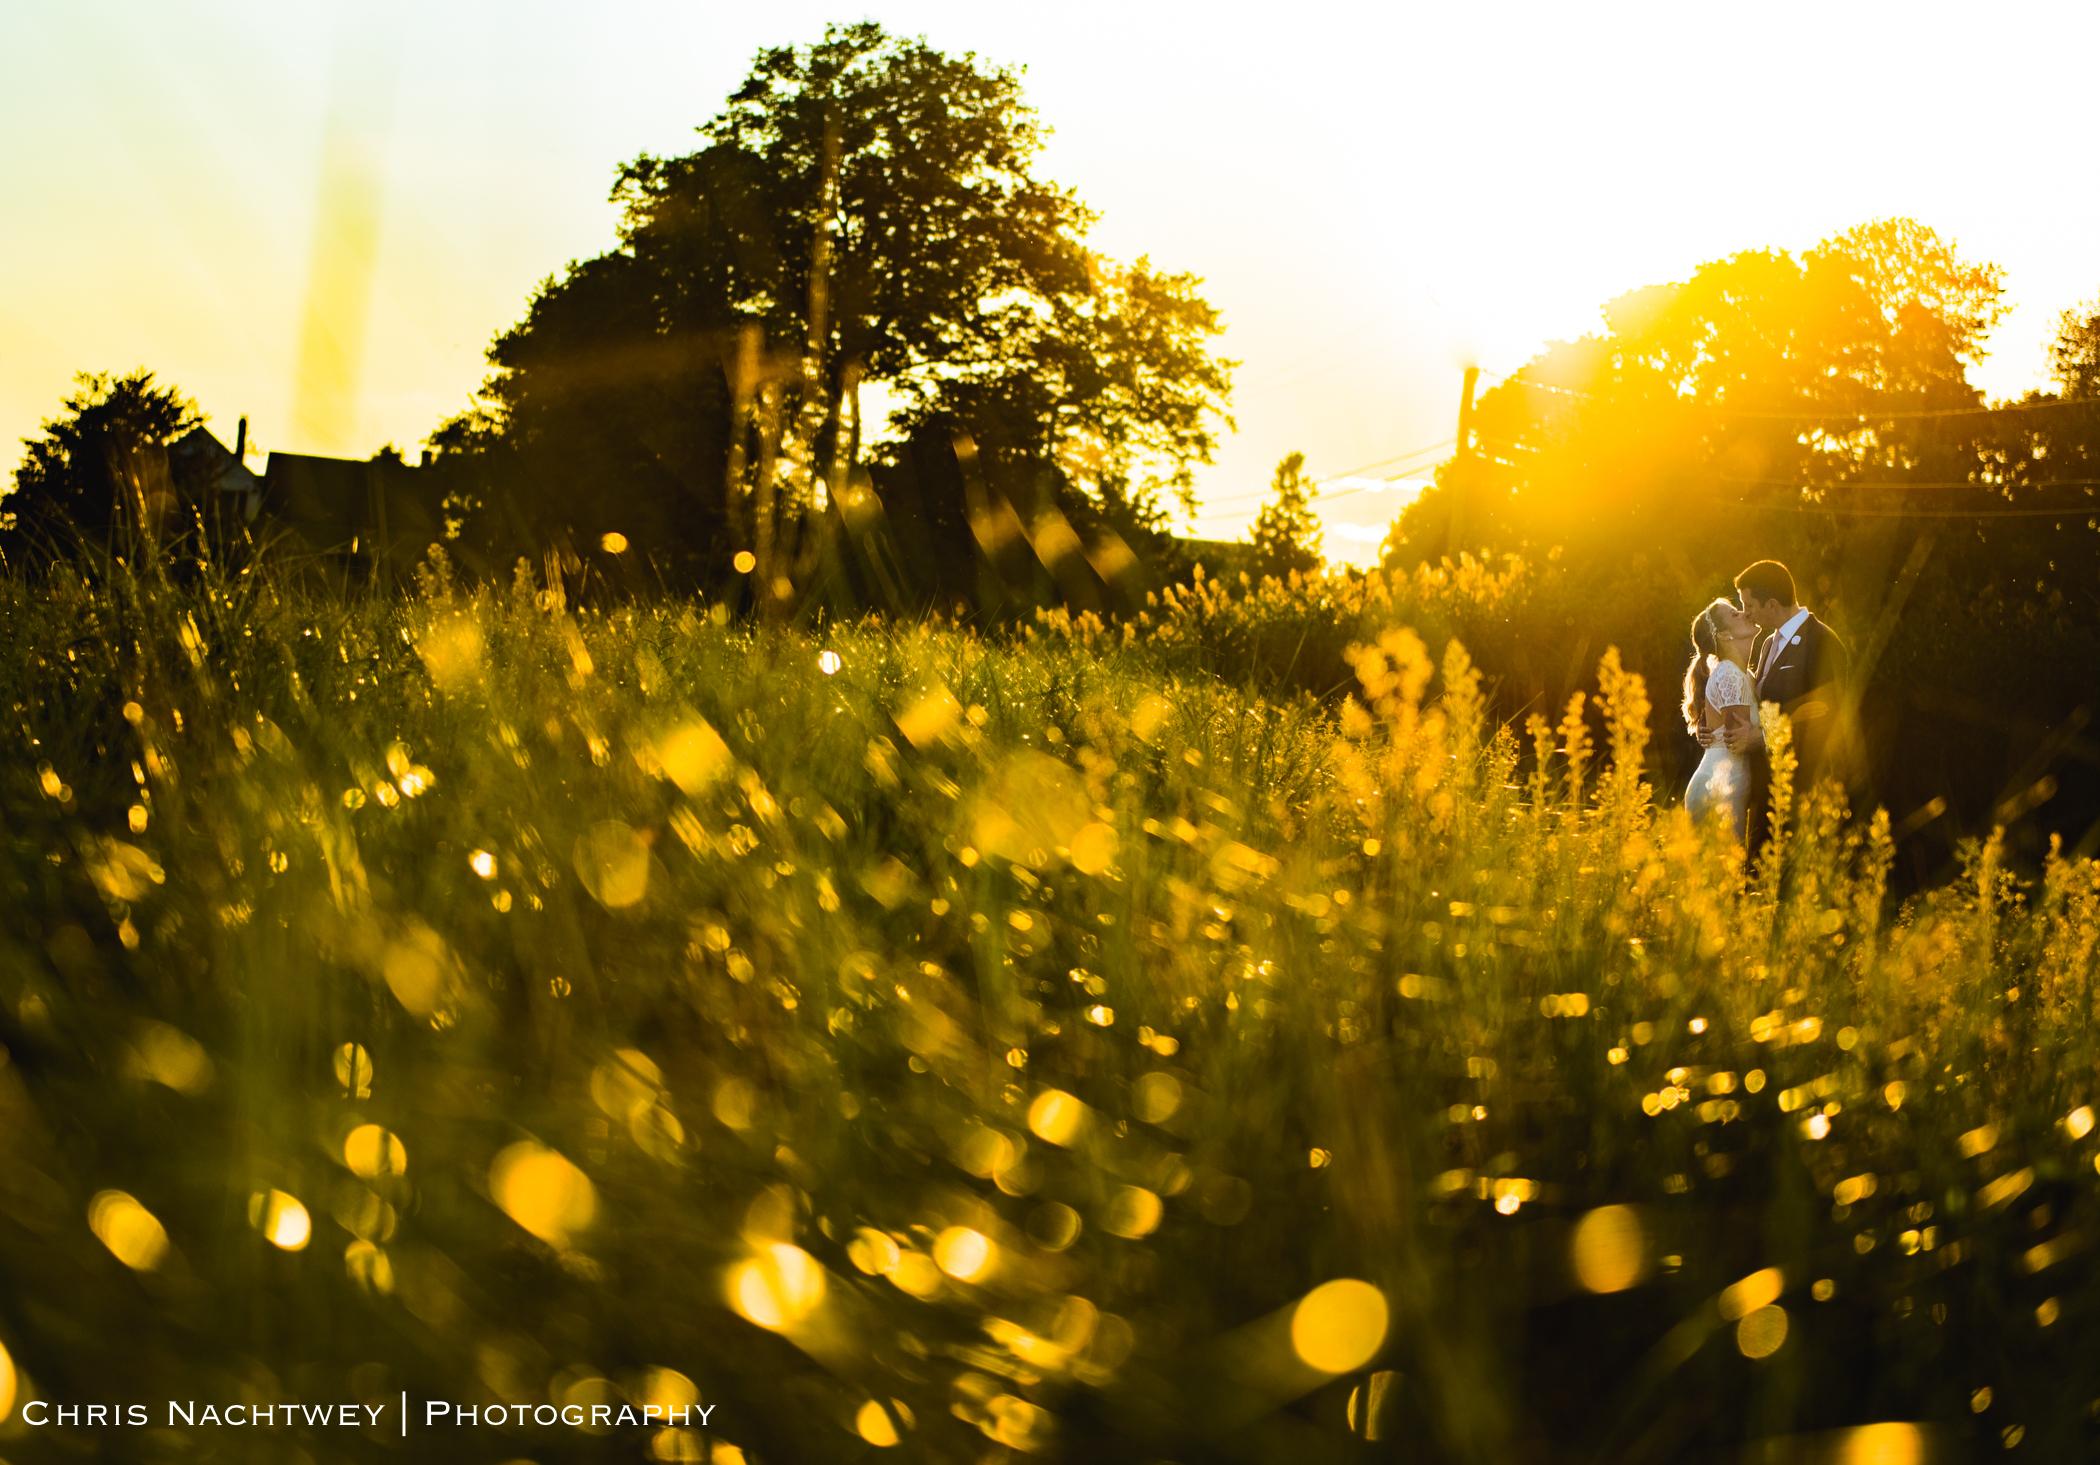 artistic-ct-wedding-photographers-chris-nachtwey-2017-50.jpg